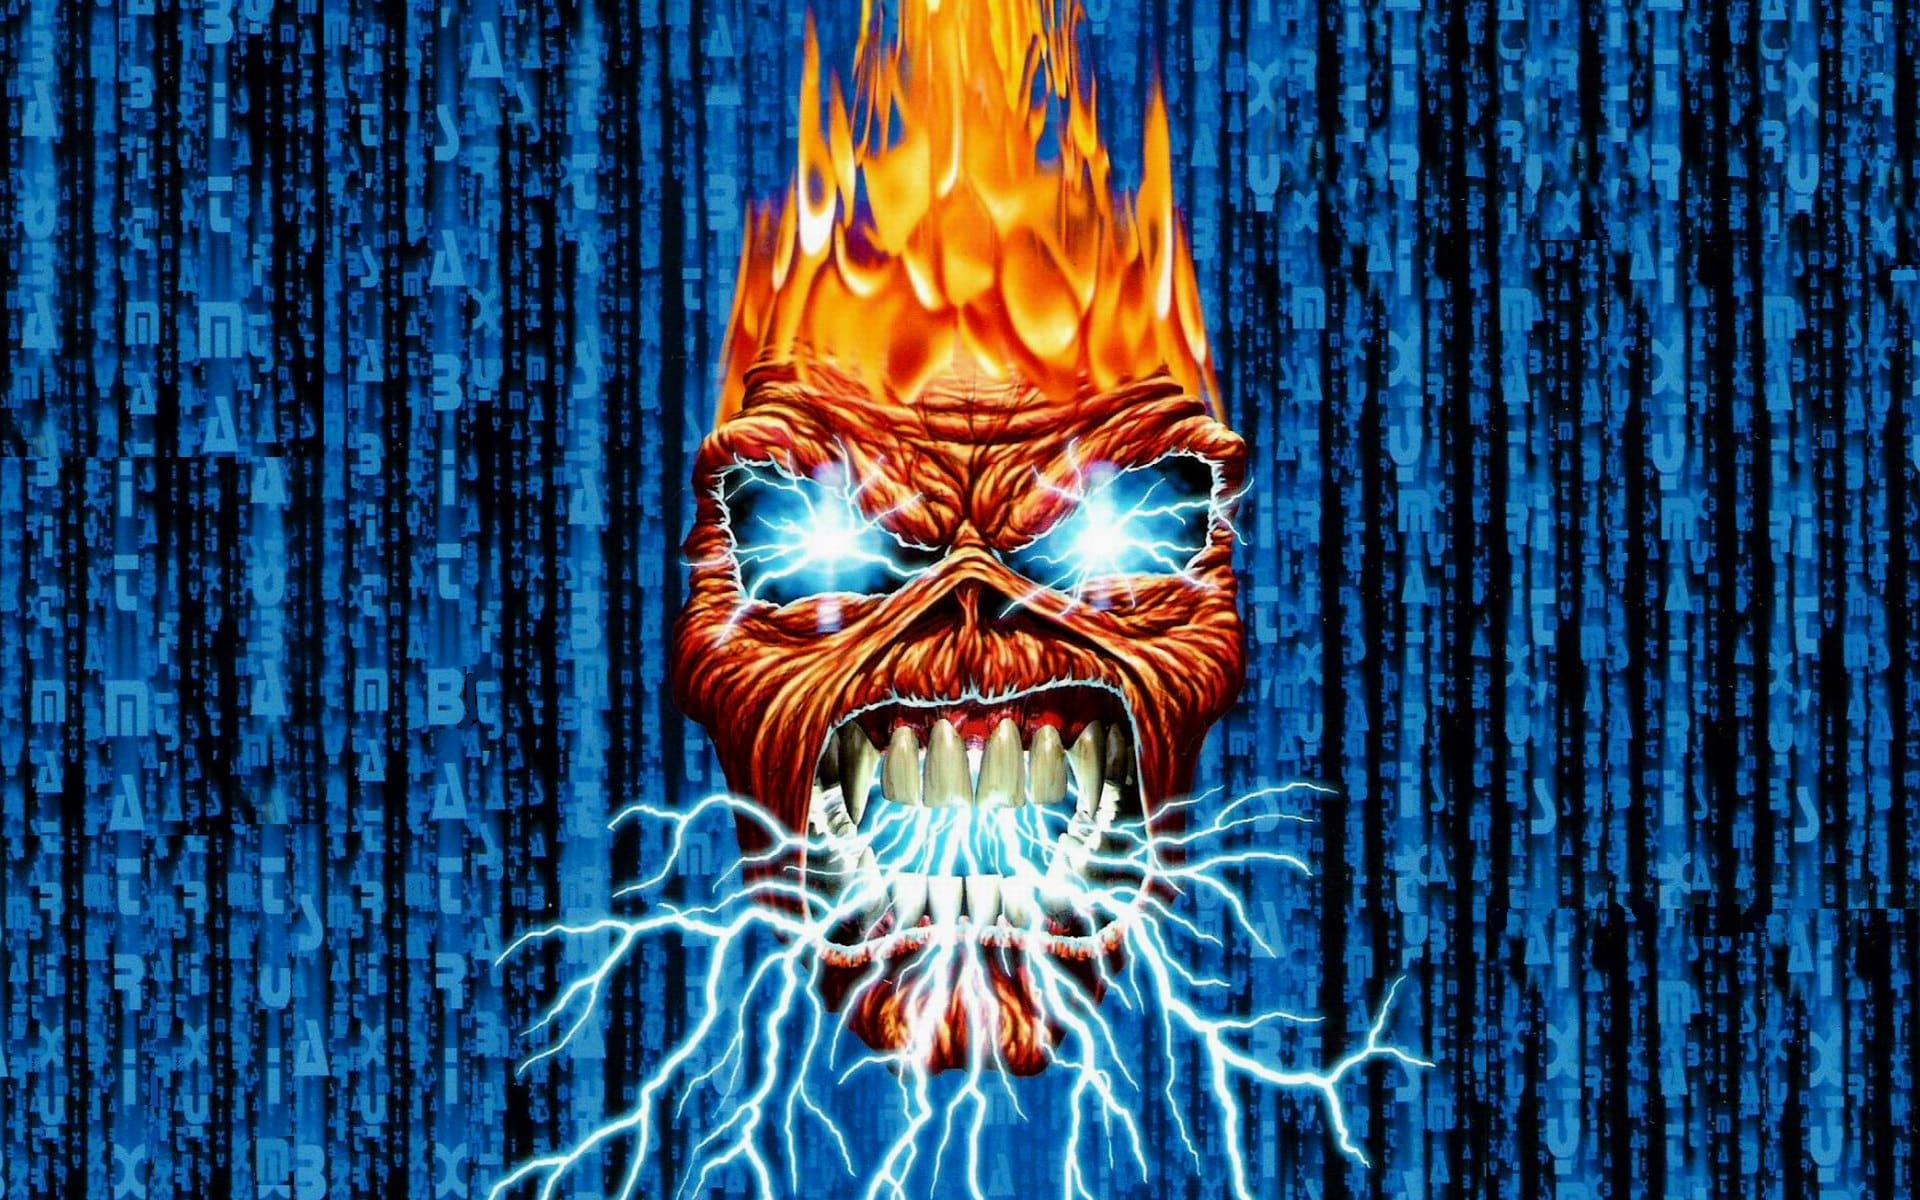 Iron Maiden Full hd wallpapers